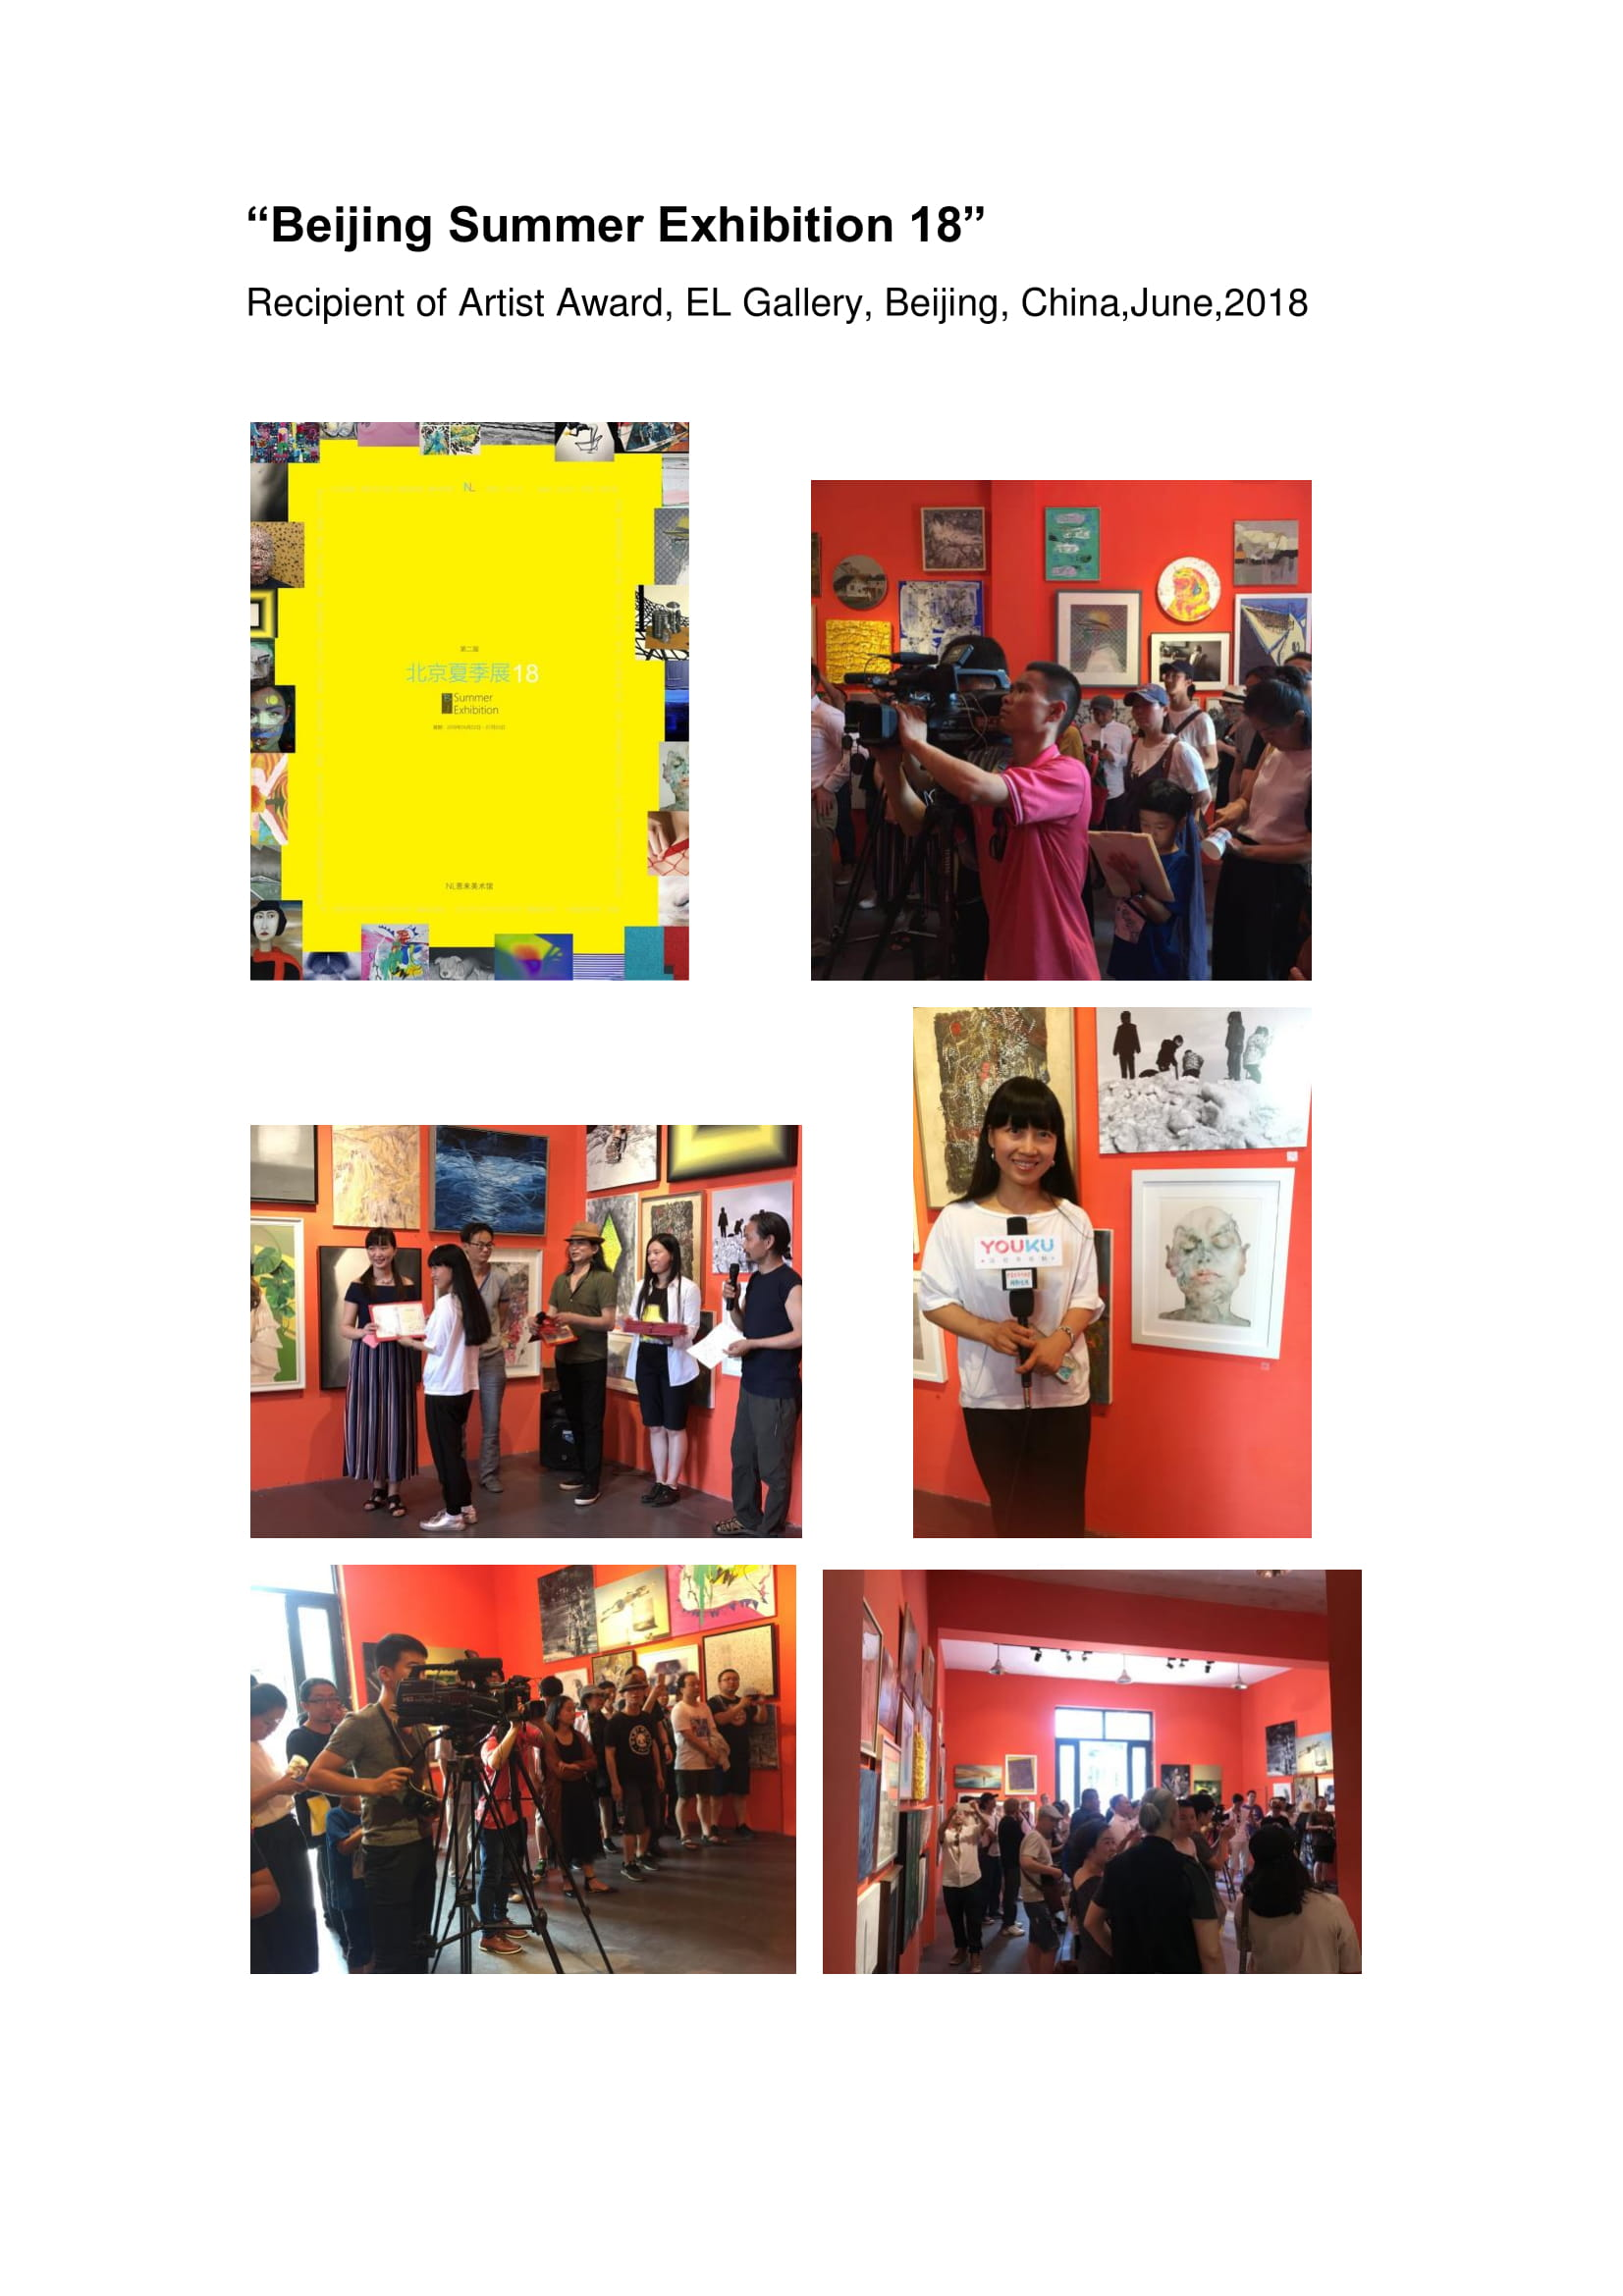 Artist Award, Beijing Summer Exhibition 18-1.jpg